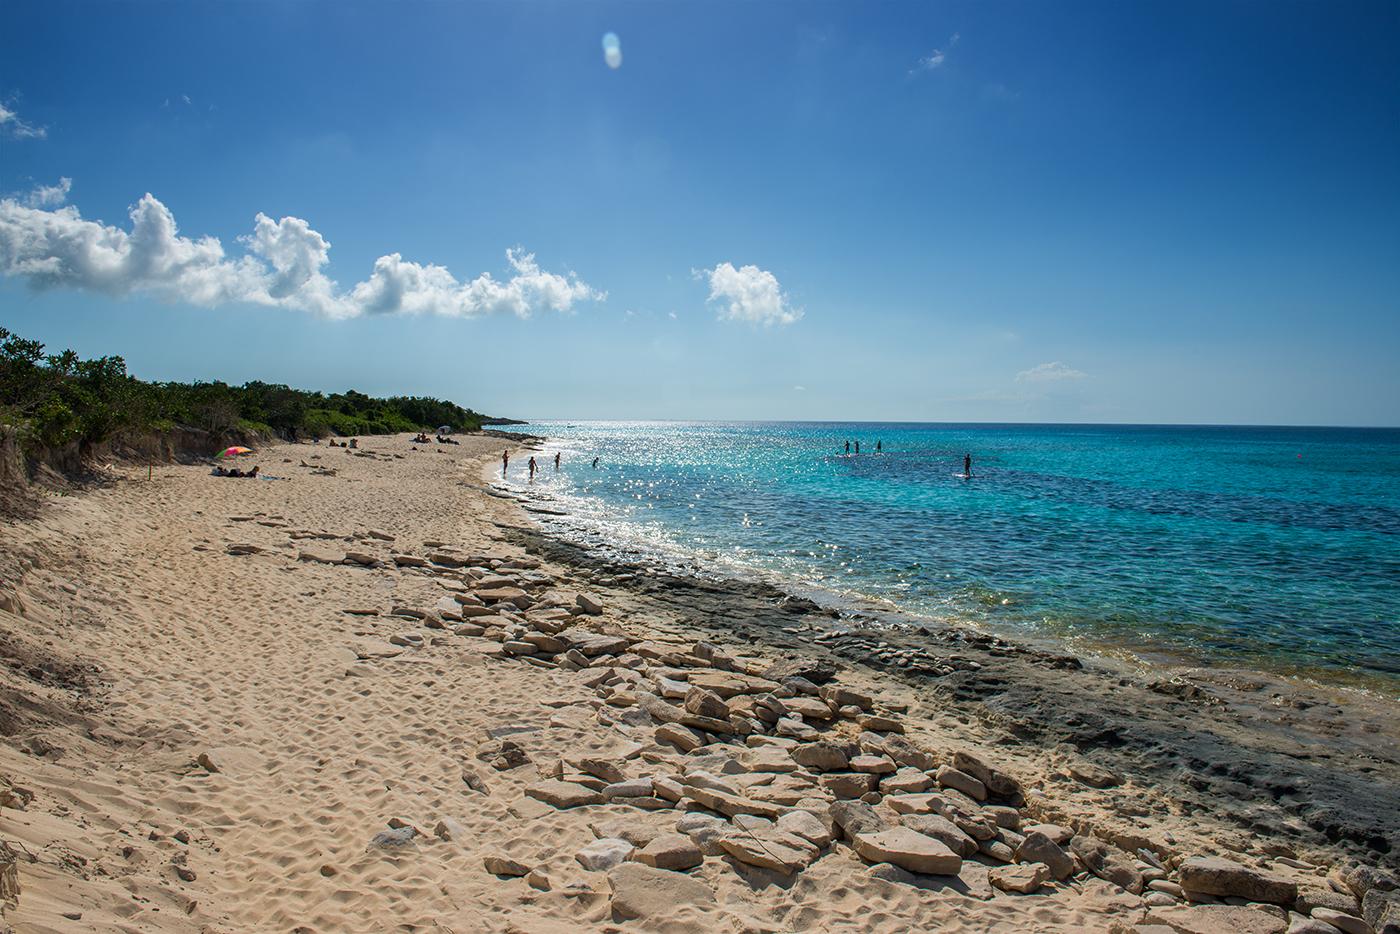 Turks and Caicos Malcolm Beach